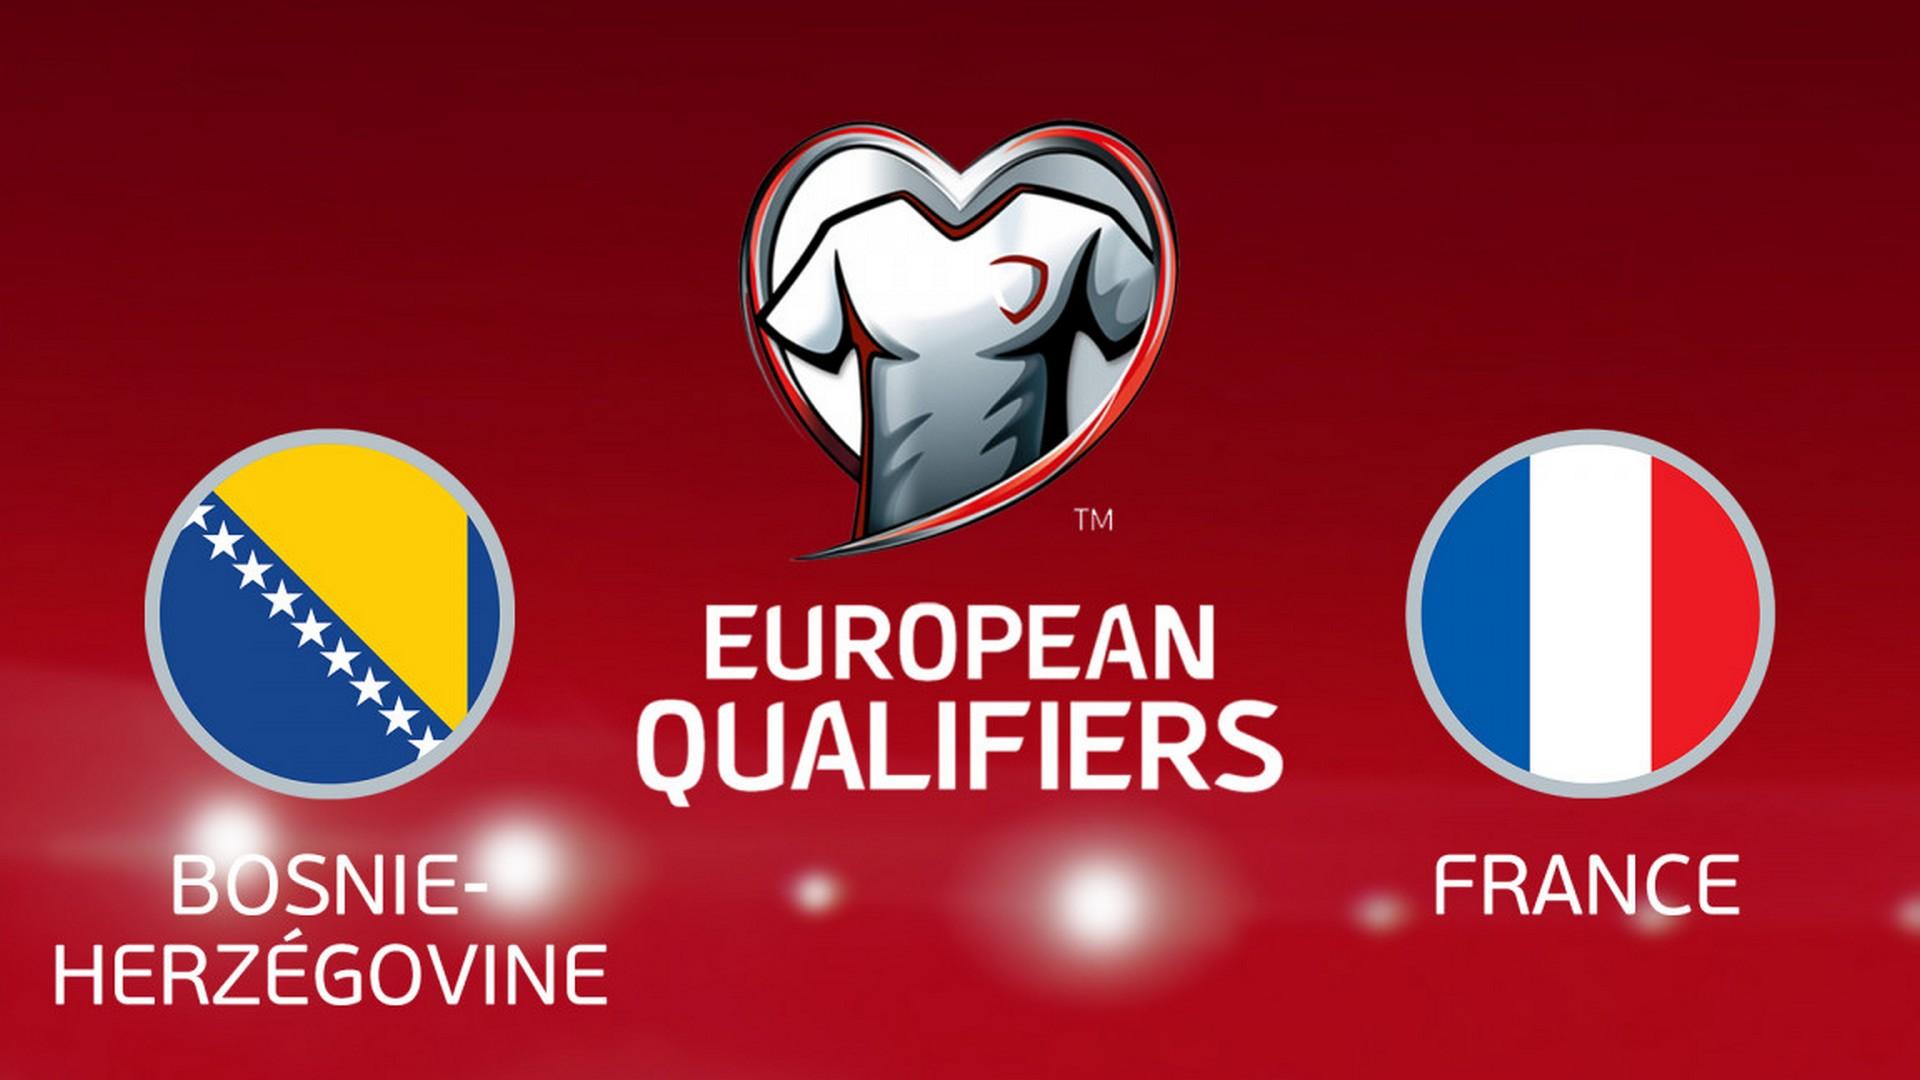 European Qualifiers France